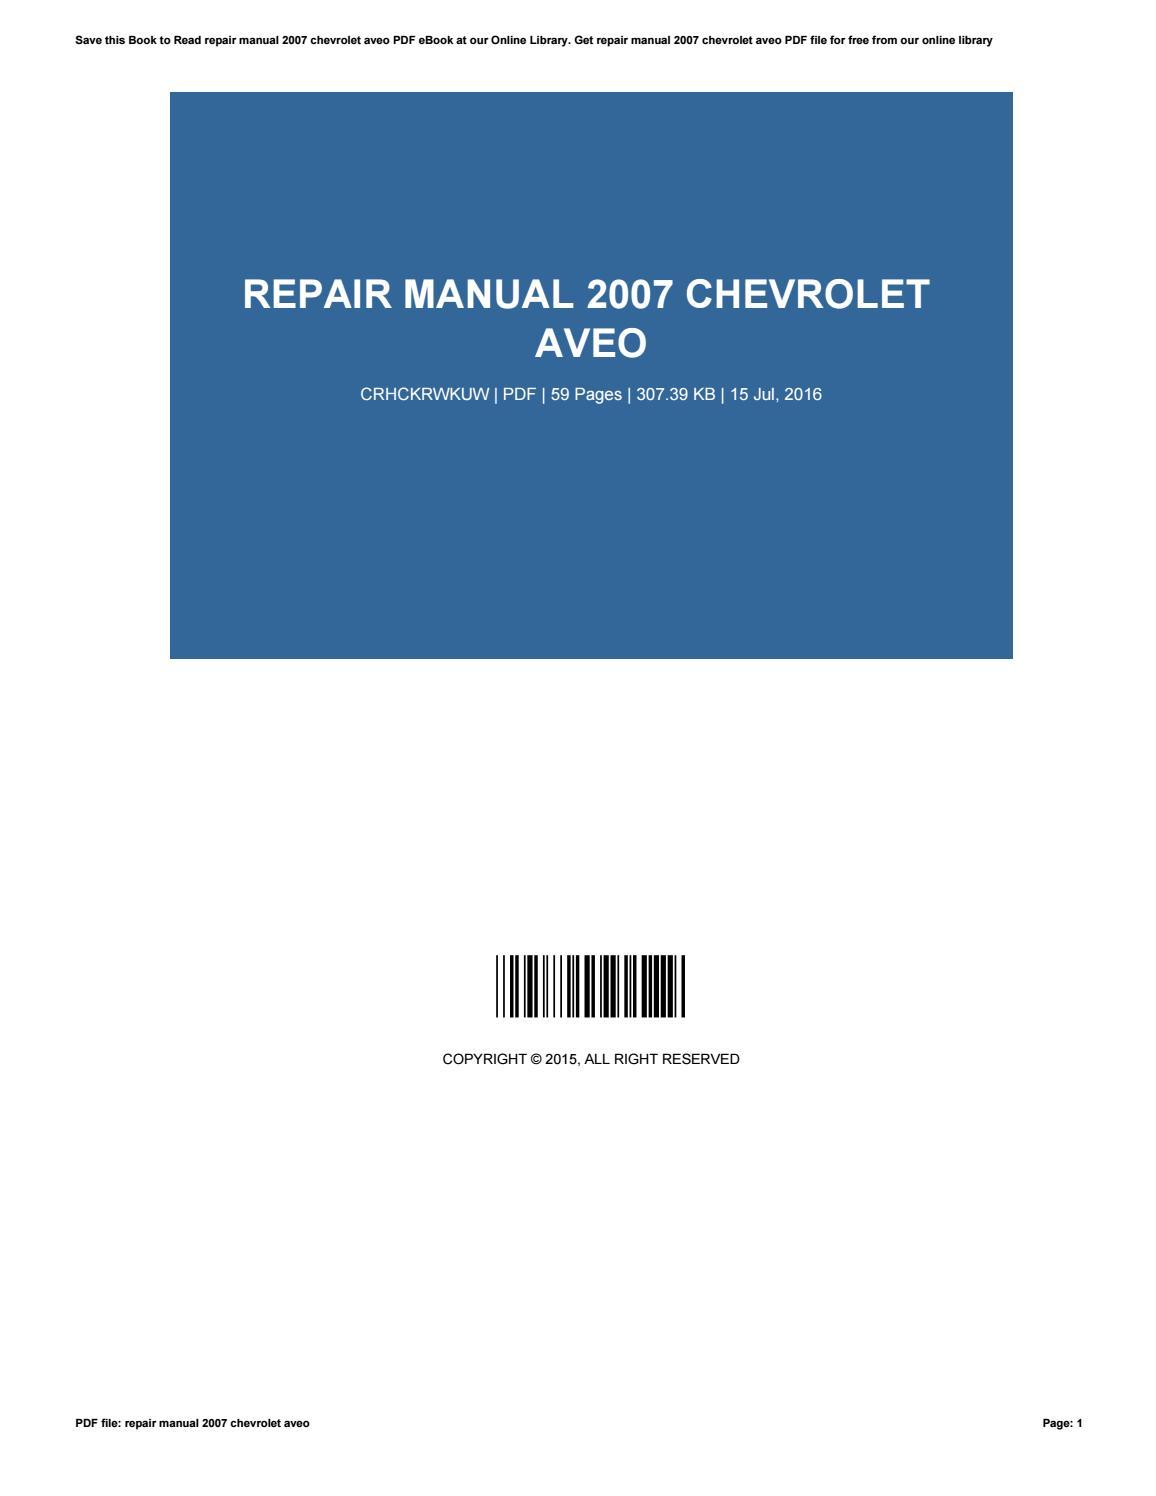 repair manual 2007 chevrolet aveo by stephengardner3766 issuu rh issuu com 1999 Chevrolet Tahoe 2006 Mazda 6 Repair Manual